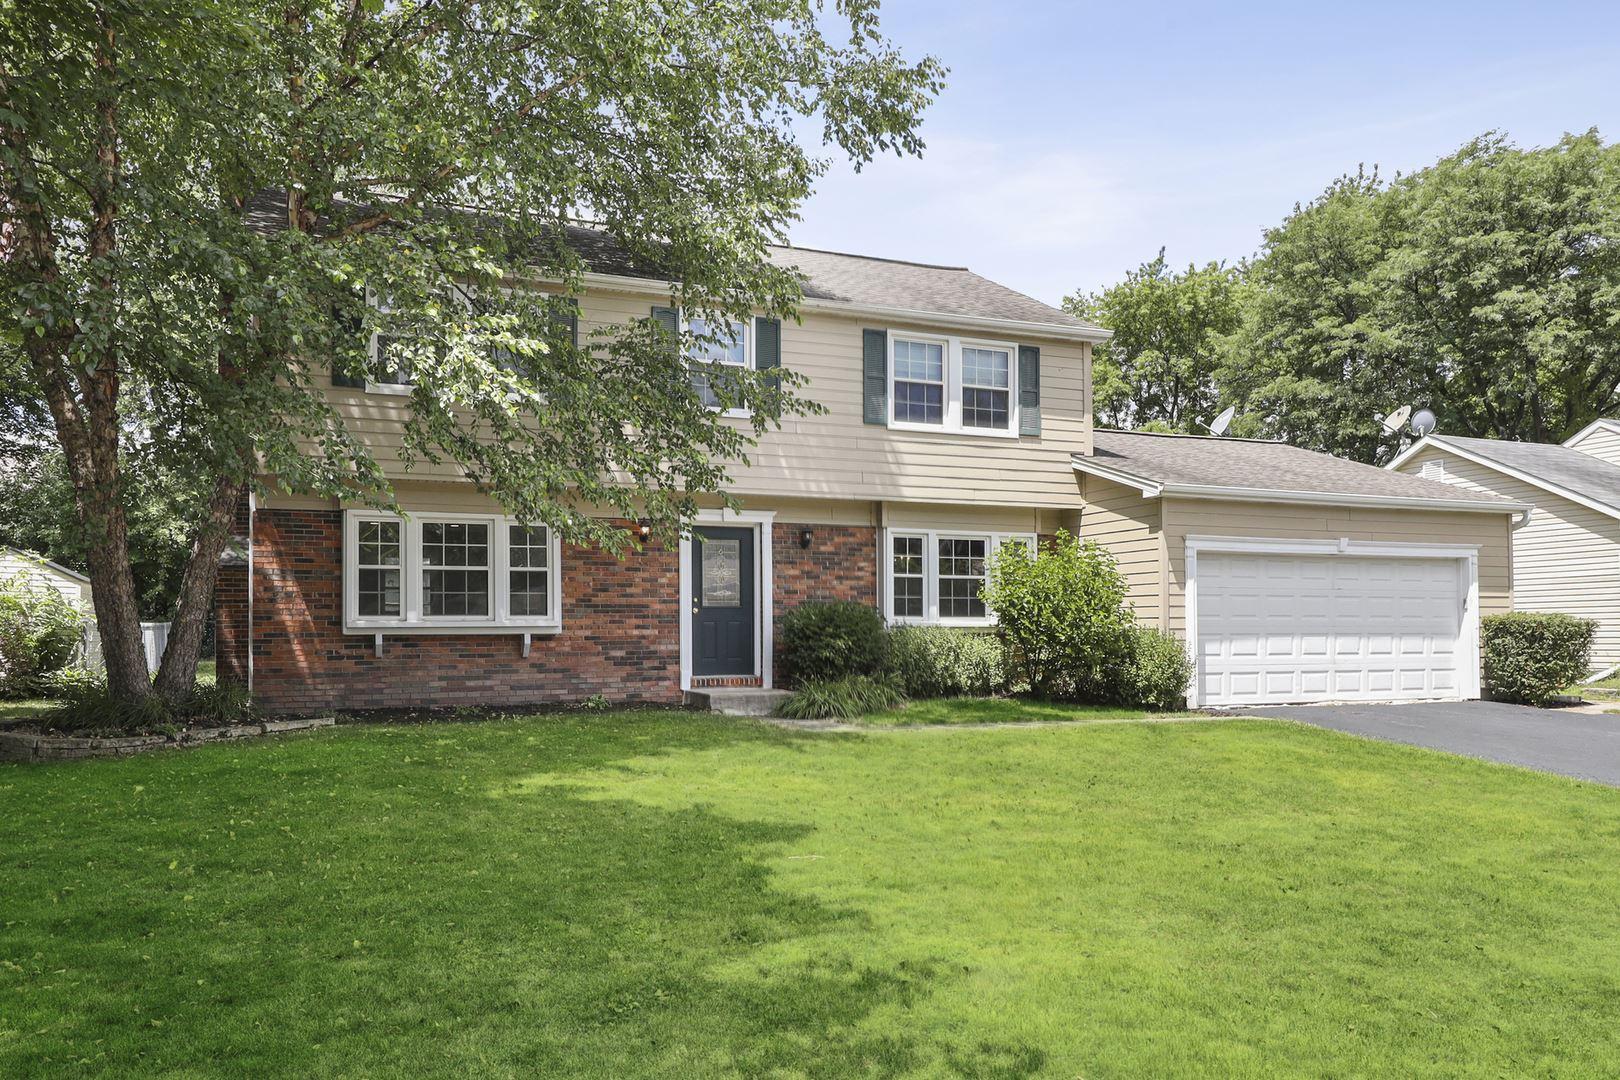 691 Indian Spring Lane, Buffalo Grove, IL 60089 - #: 10772938